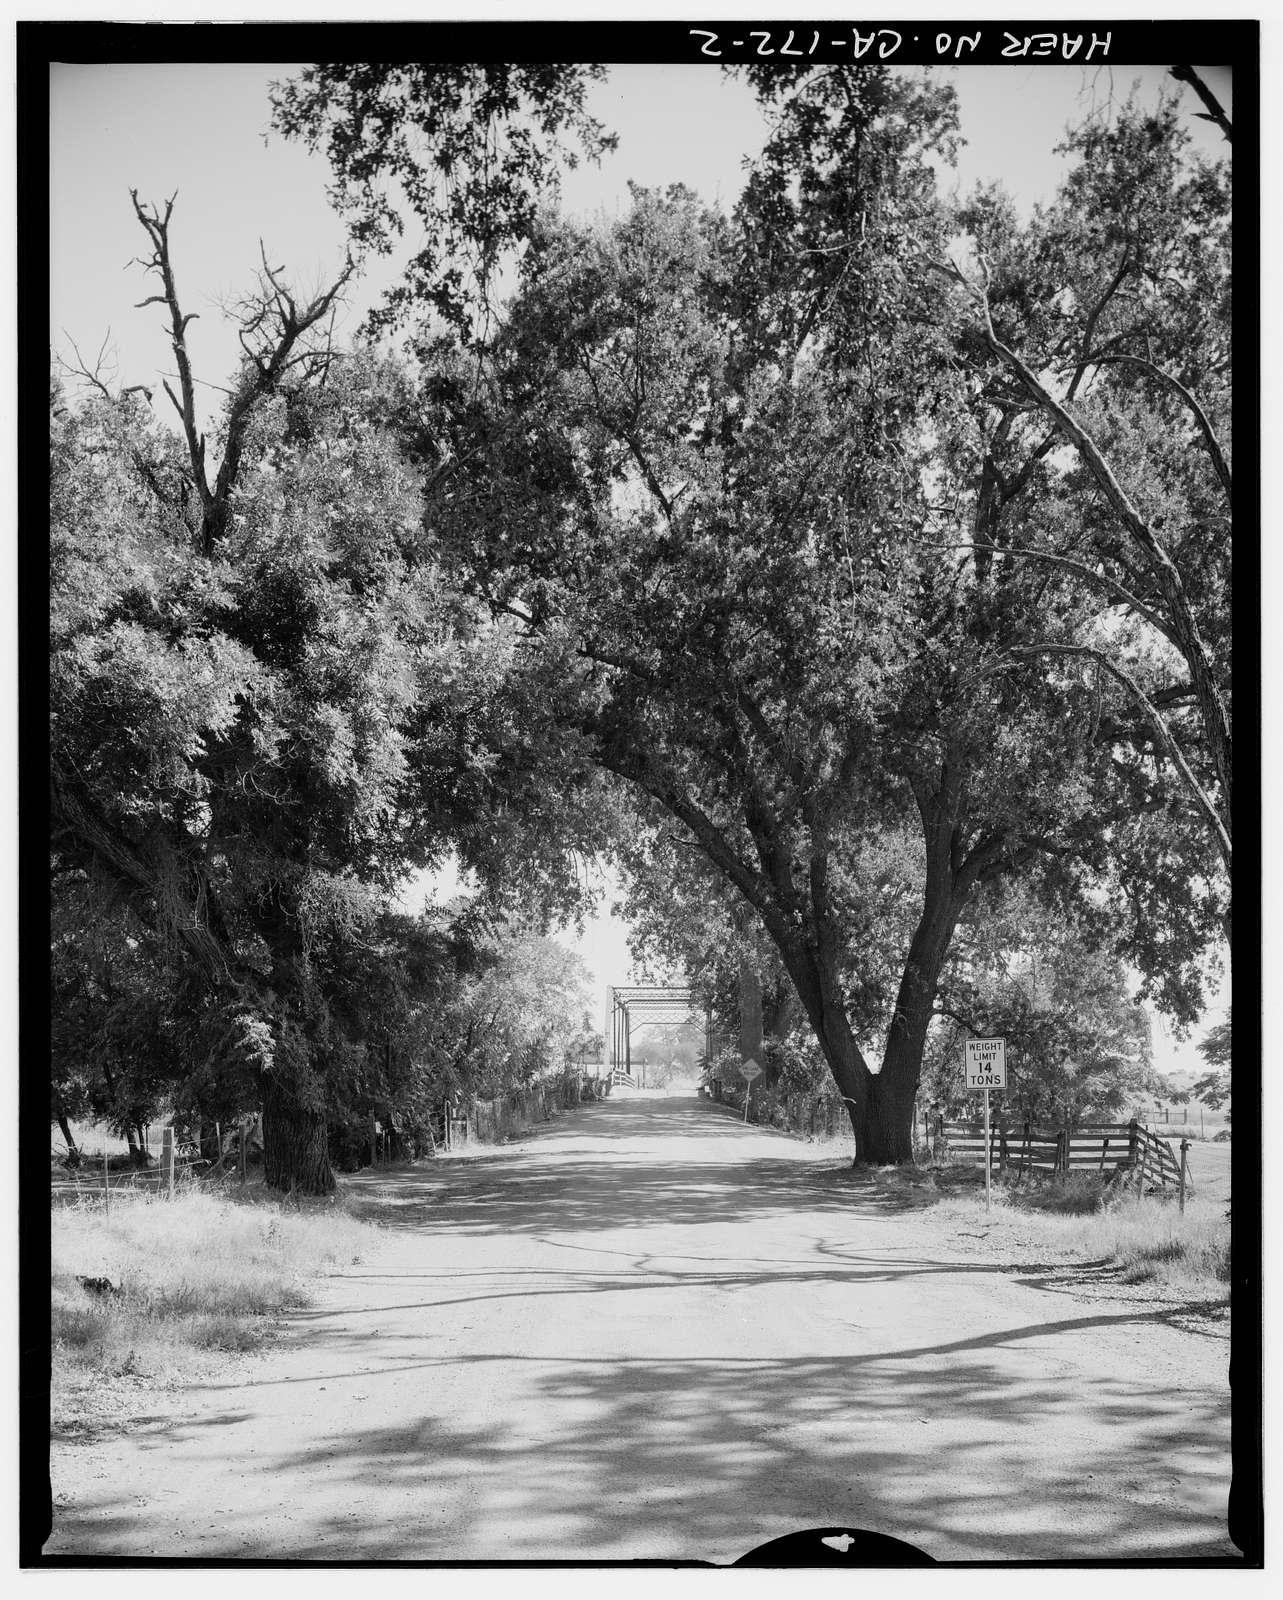 Dry Creek Bridge, Spanning Dry Creek at Cook Road, Ione, Amador County, CA